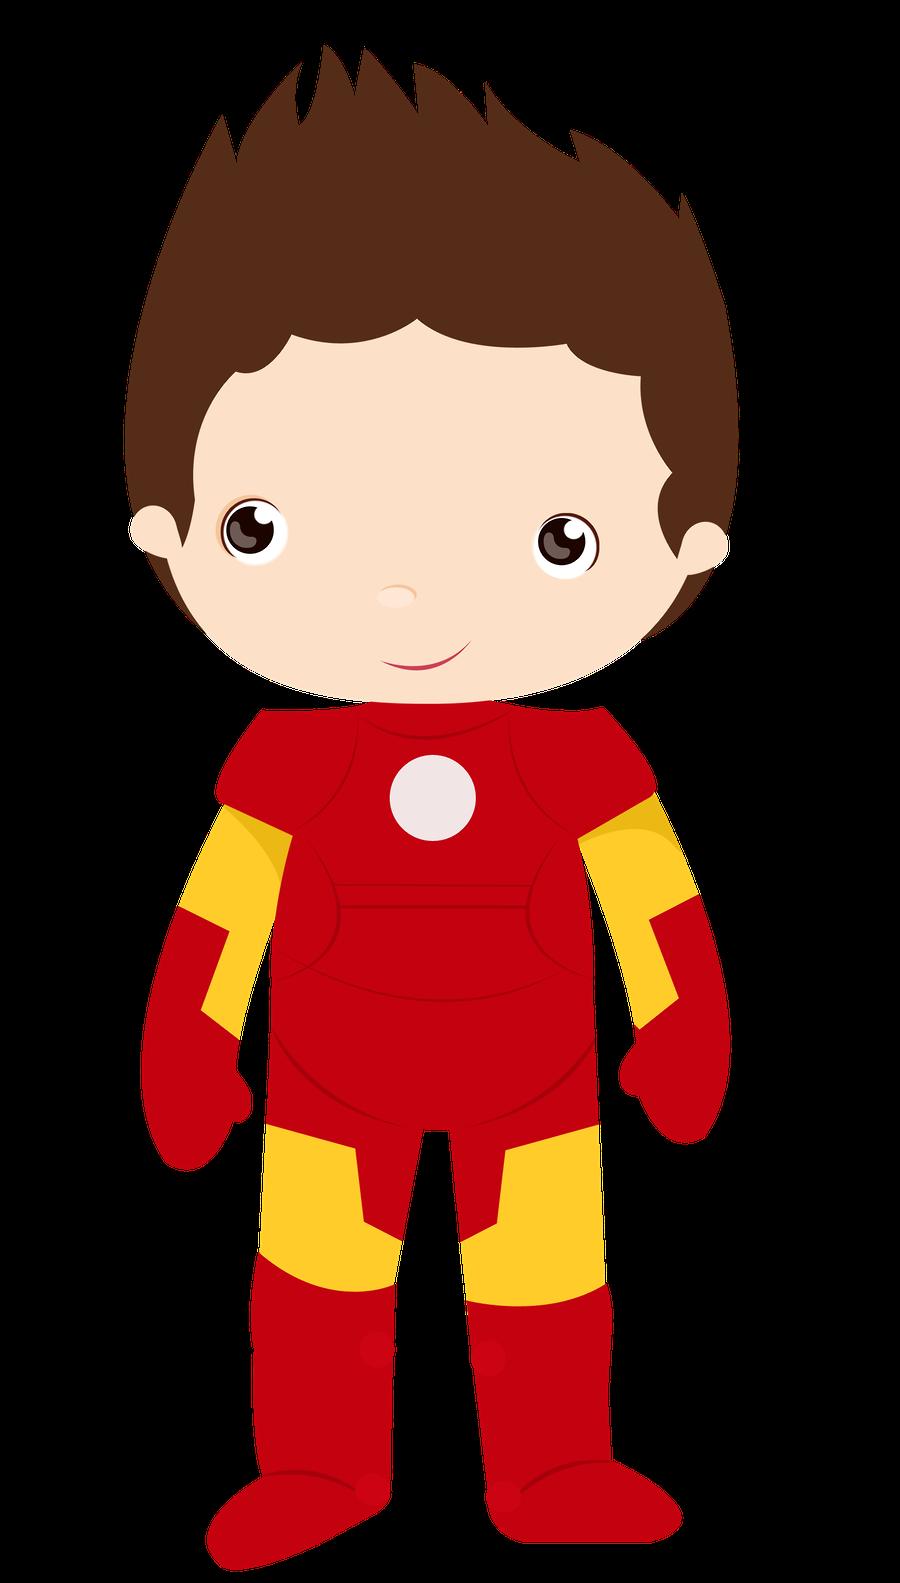 Flash clipart avenger My Clipart Fiesta! Geeks for